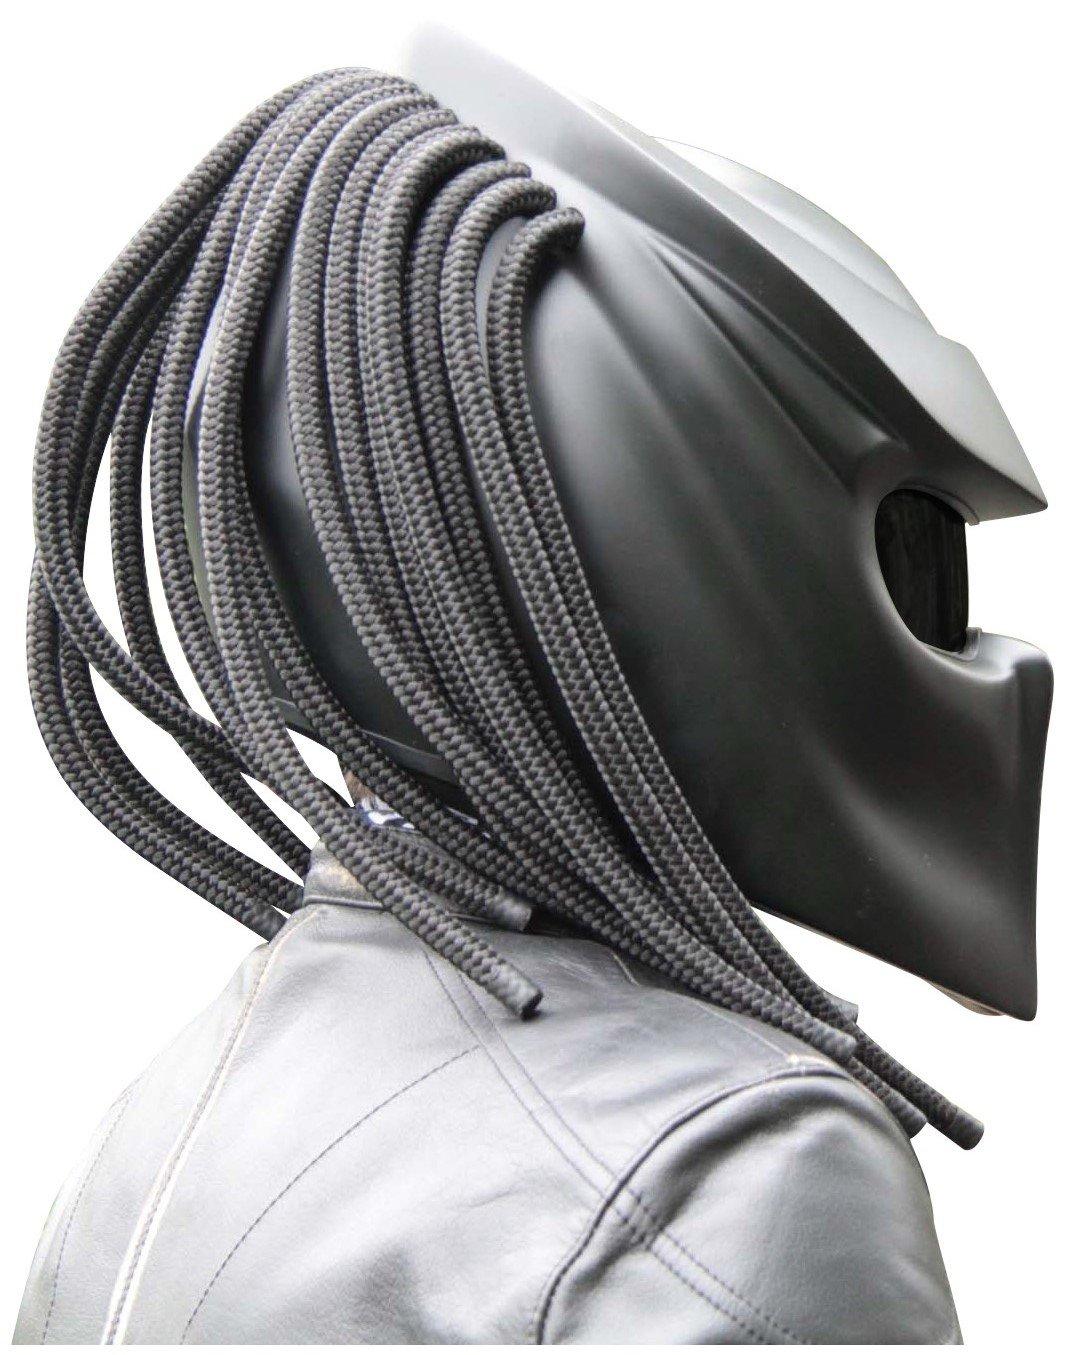 Amazon.es: Moto Casco Predator x1 Black Base Matt Made by xFF Fiber Factory Large Nero Matt